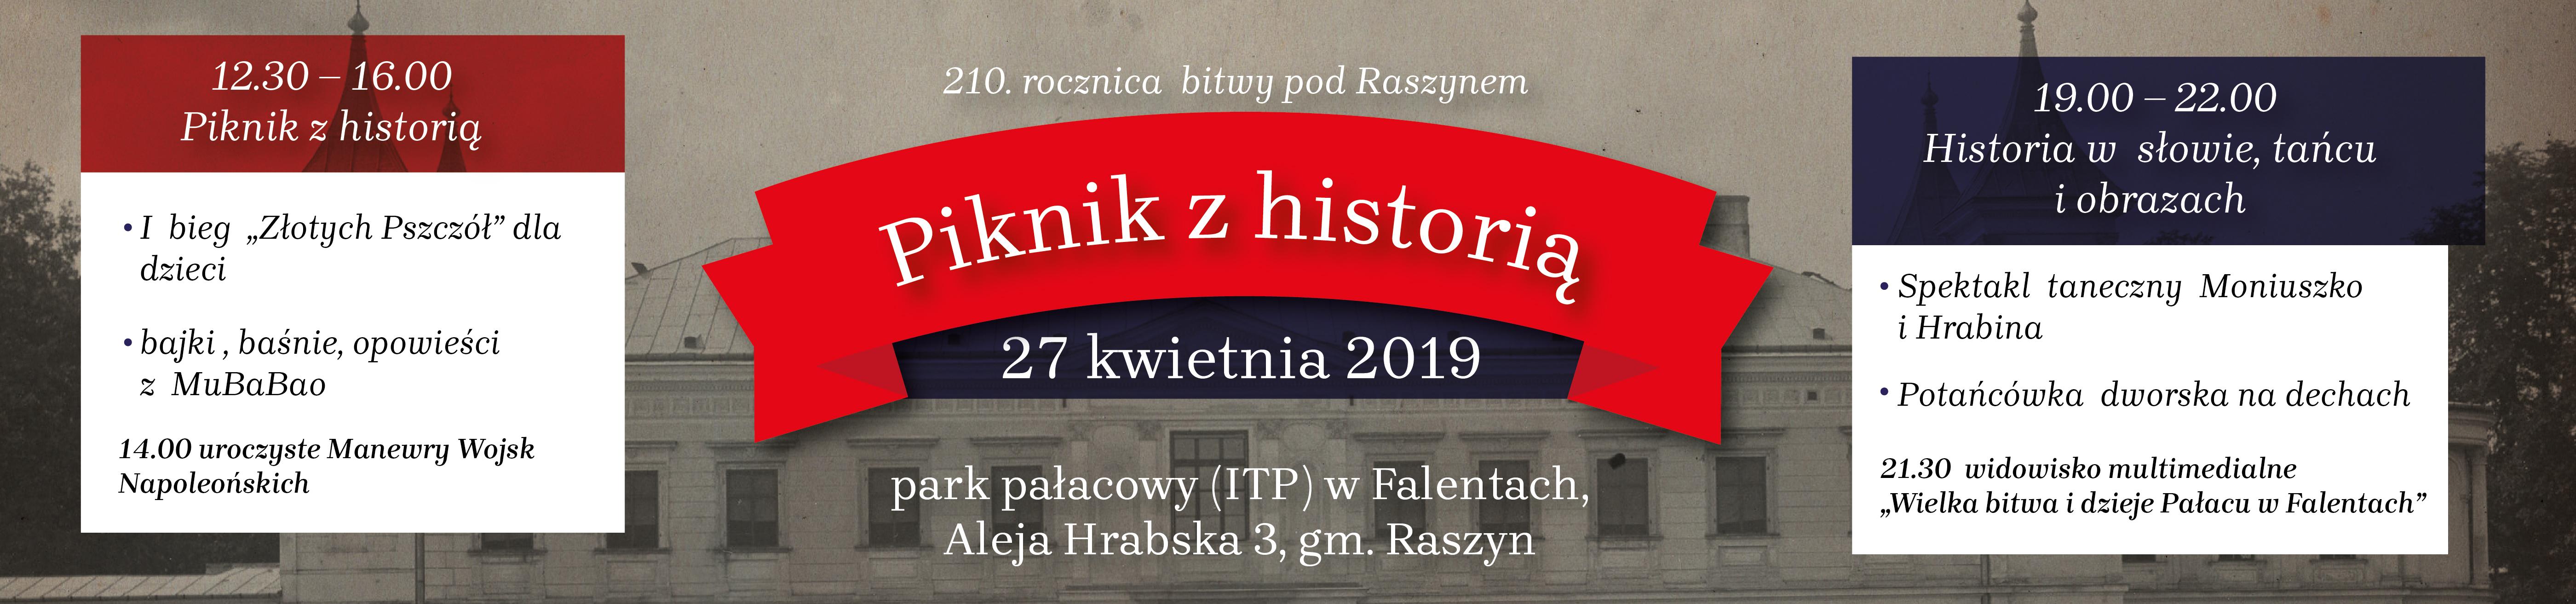 piknik-z-historia